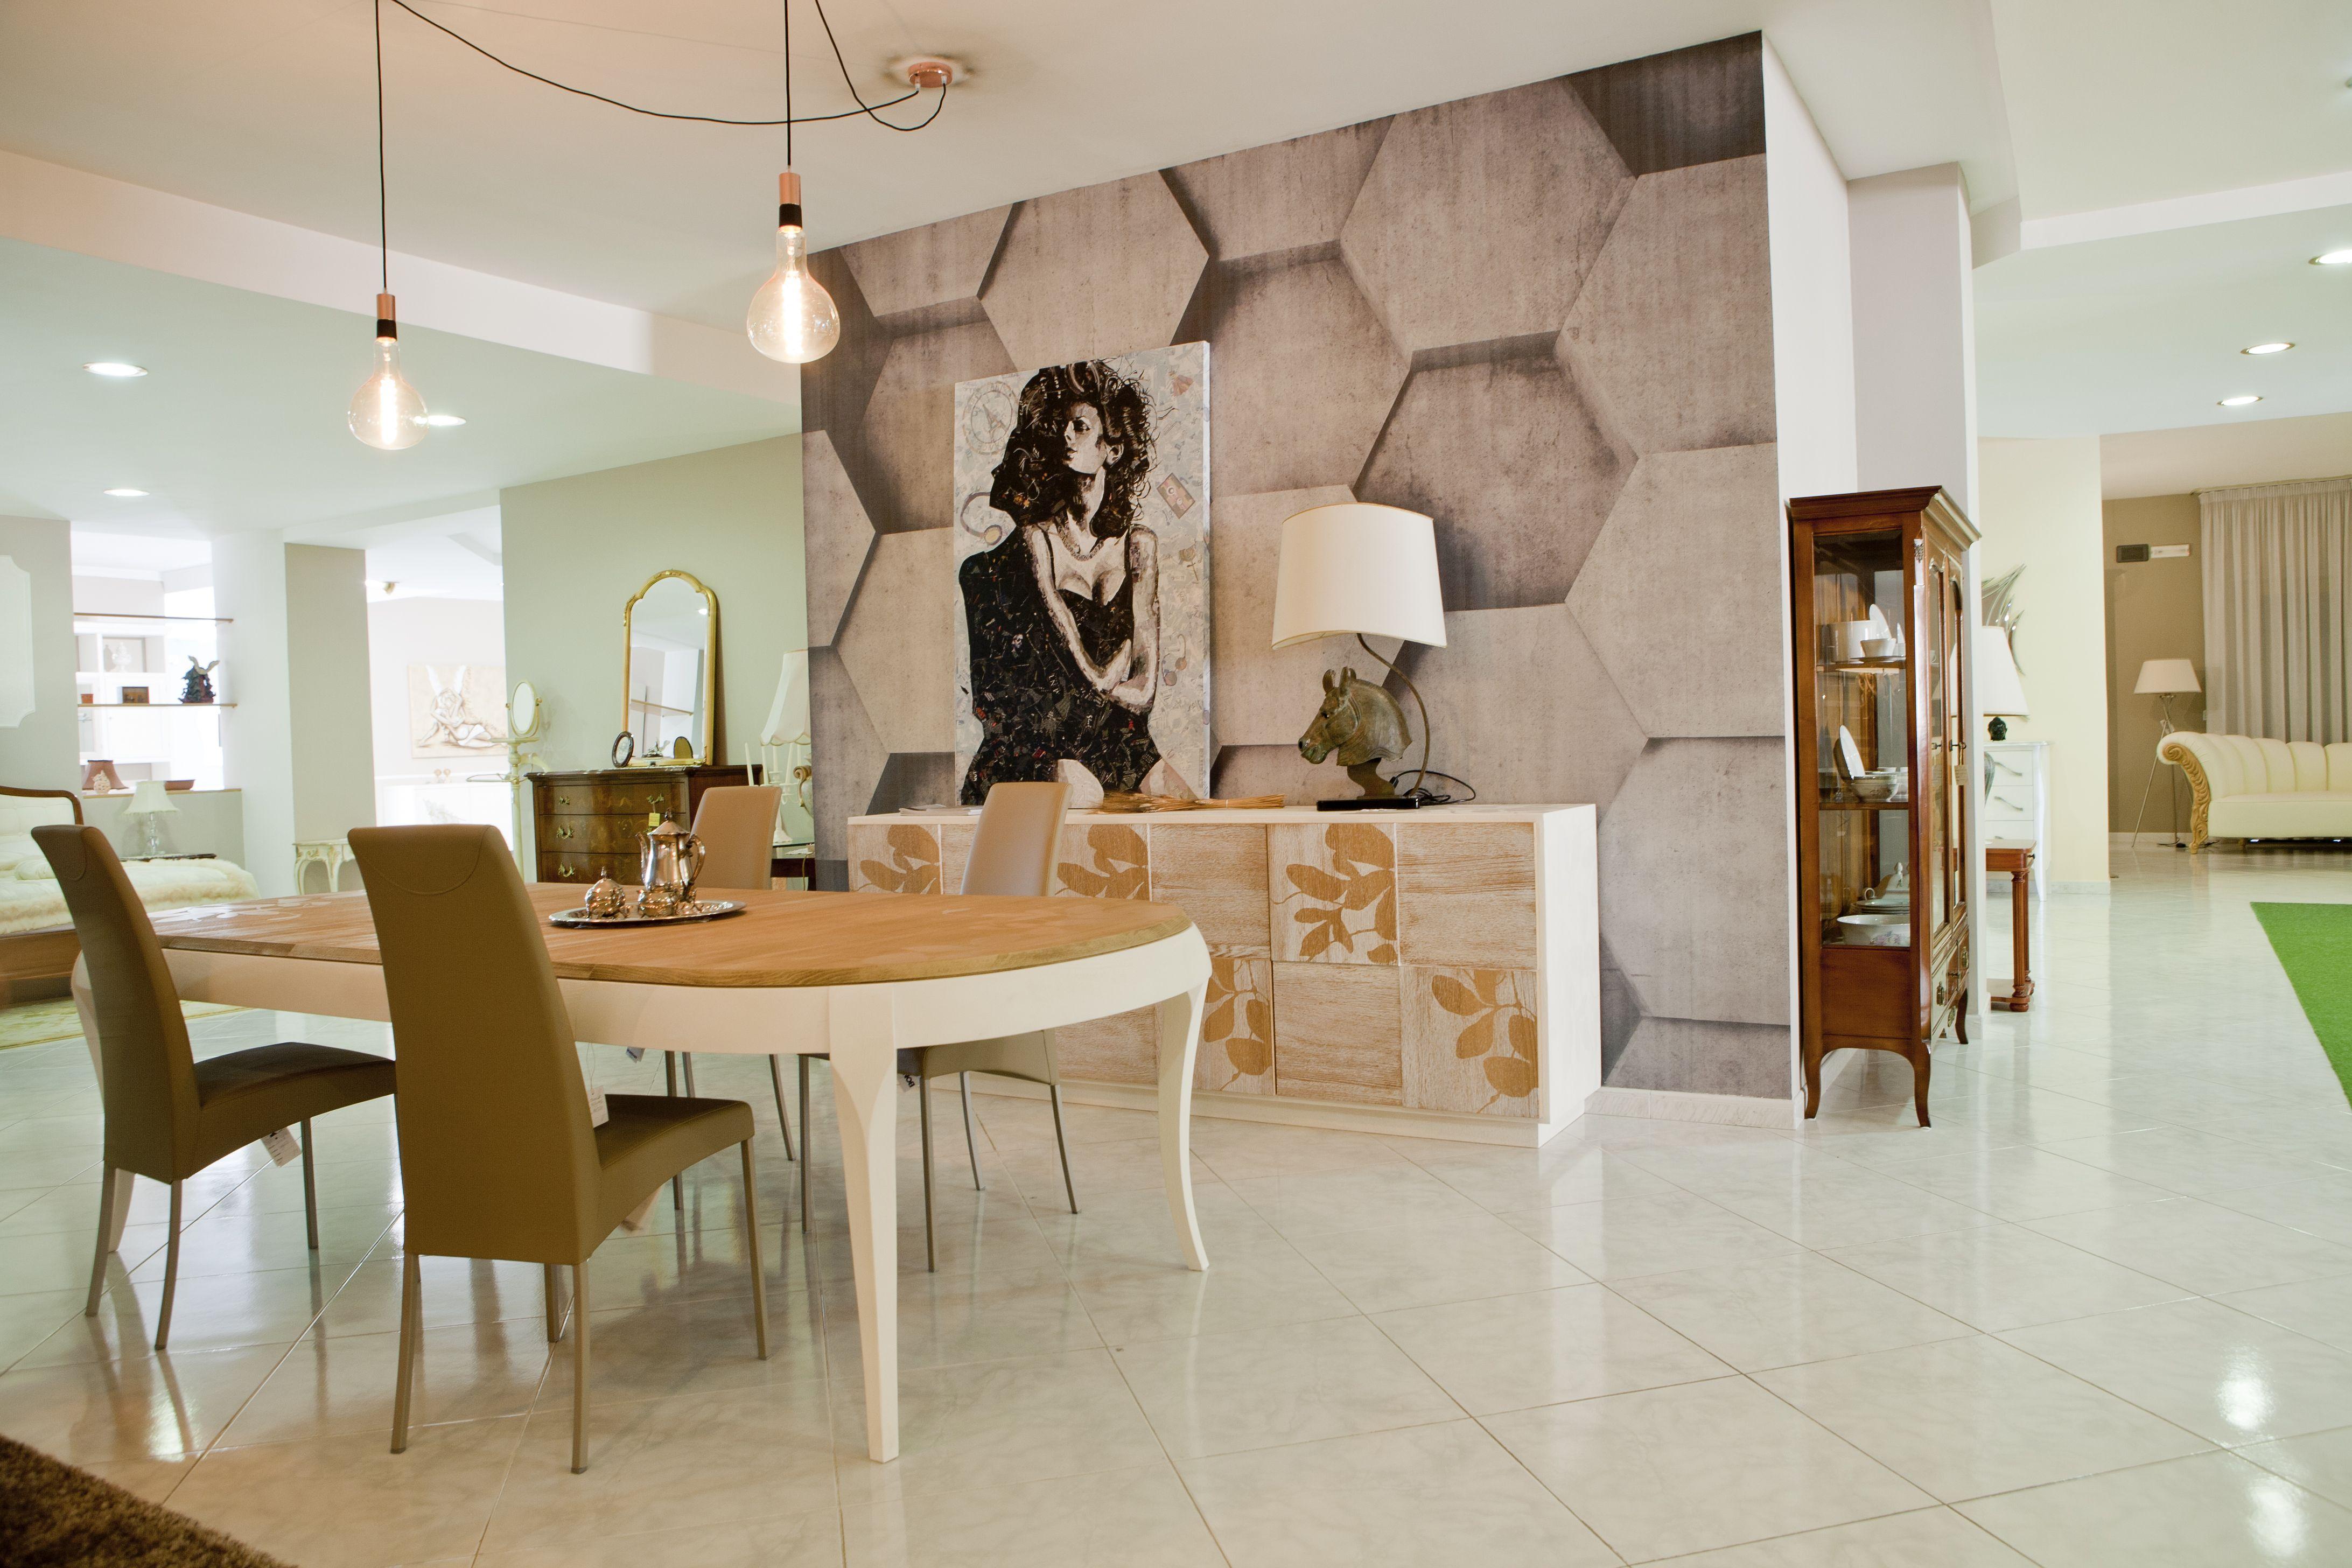 Madia #arredamento #living #interni #ideas #showroom #shabby